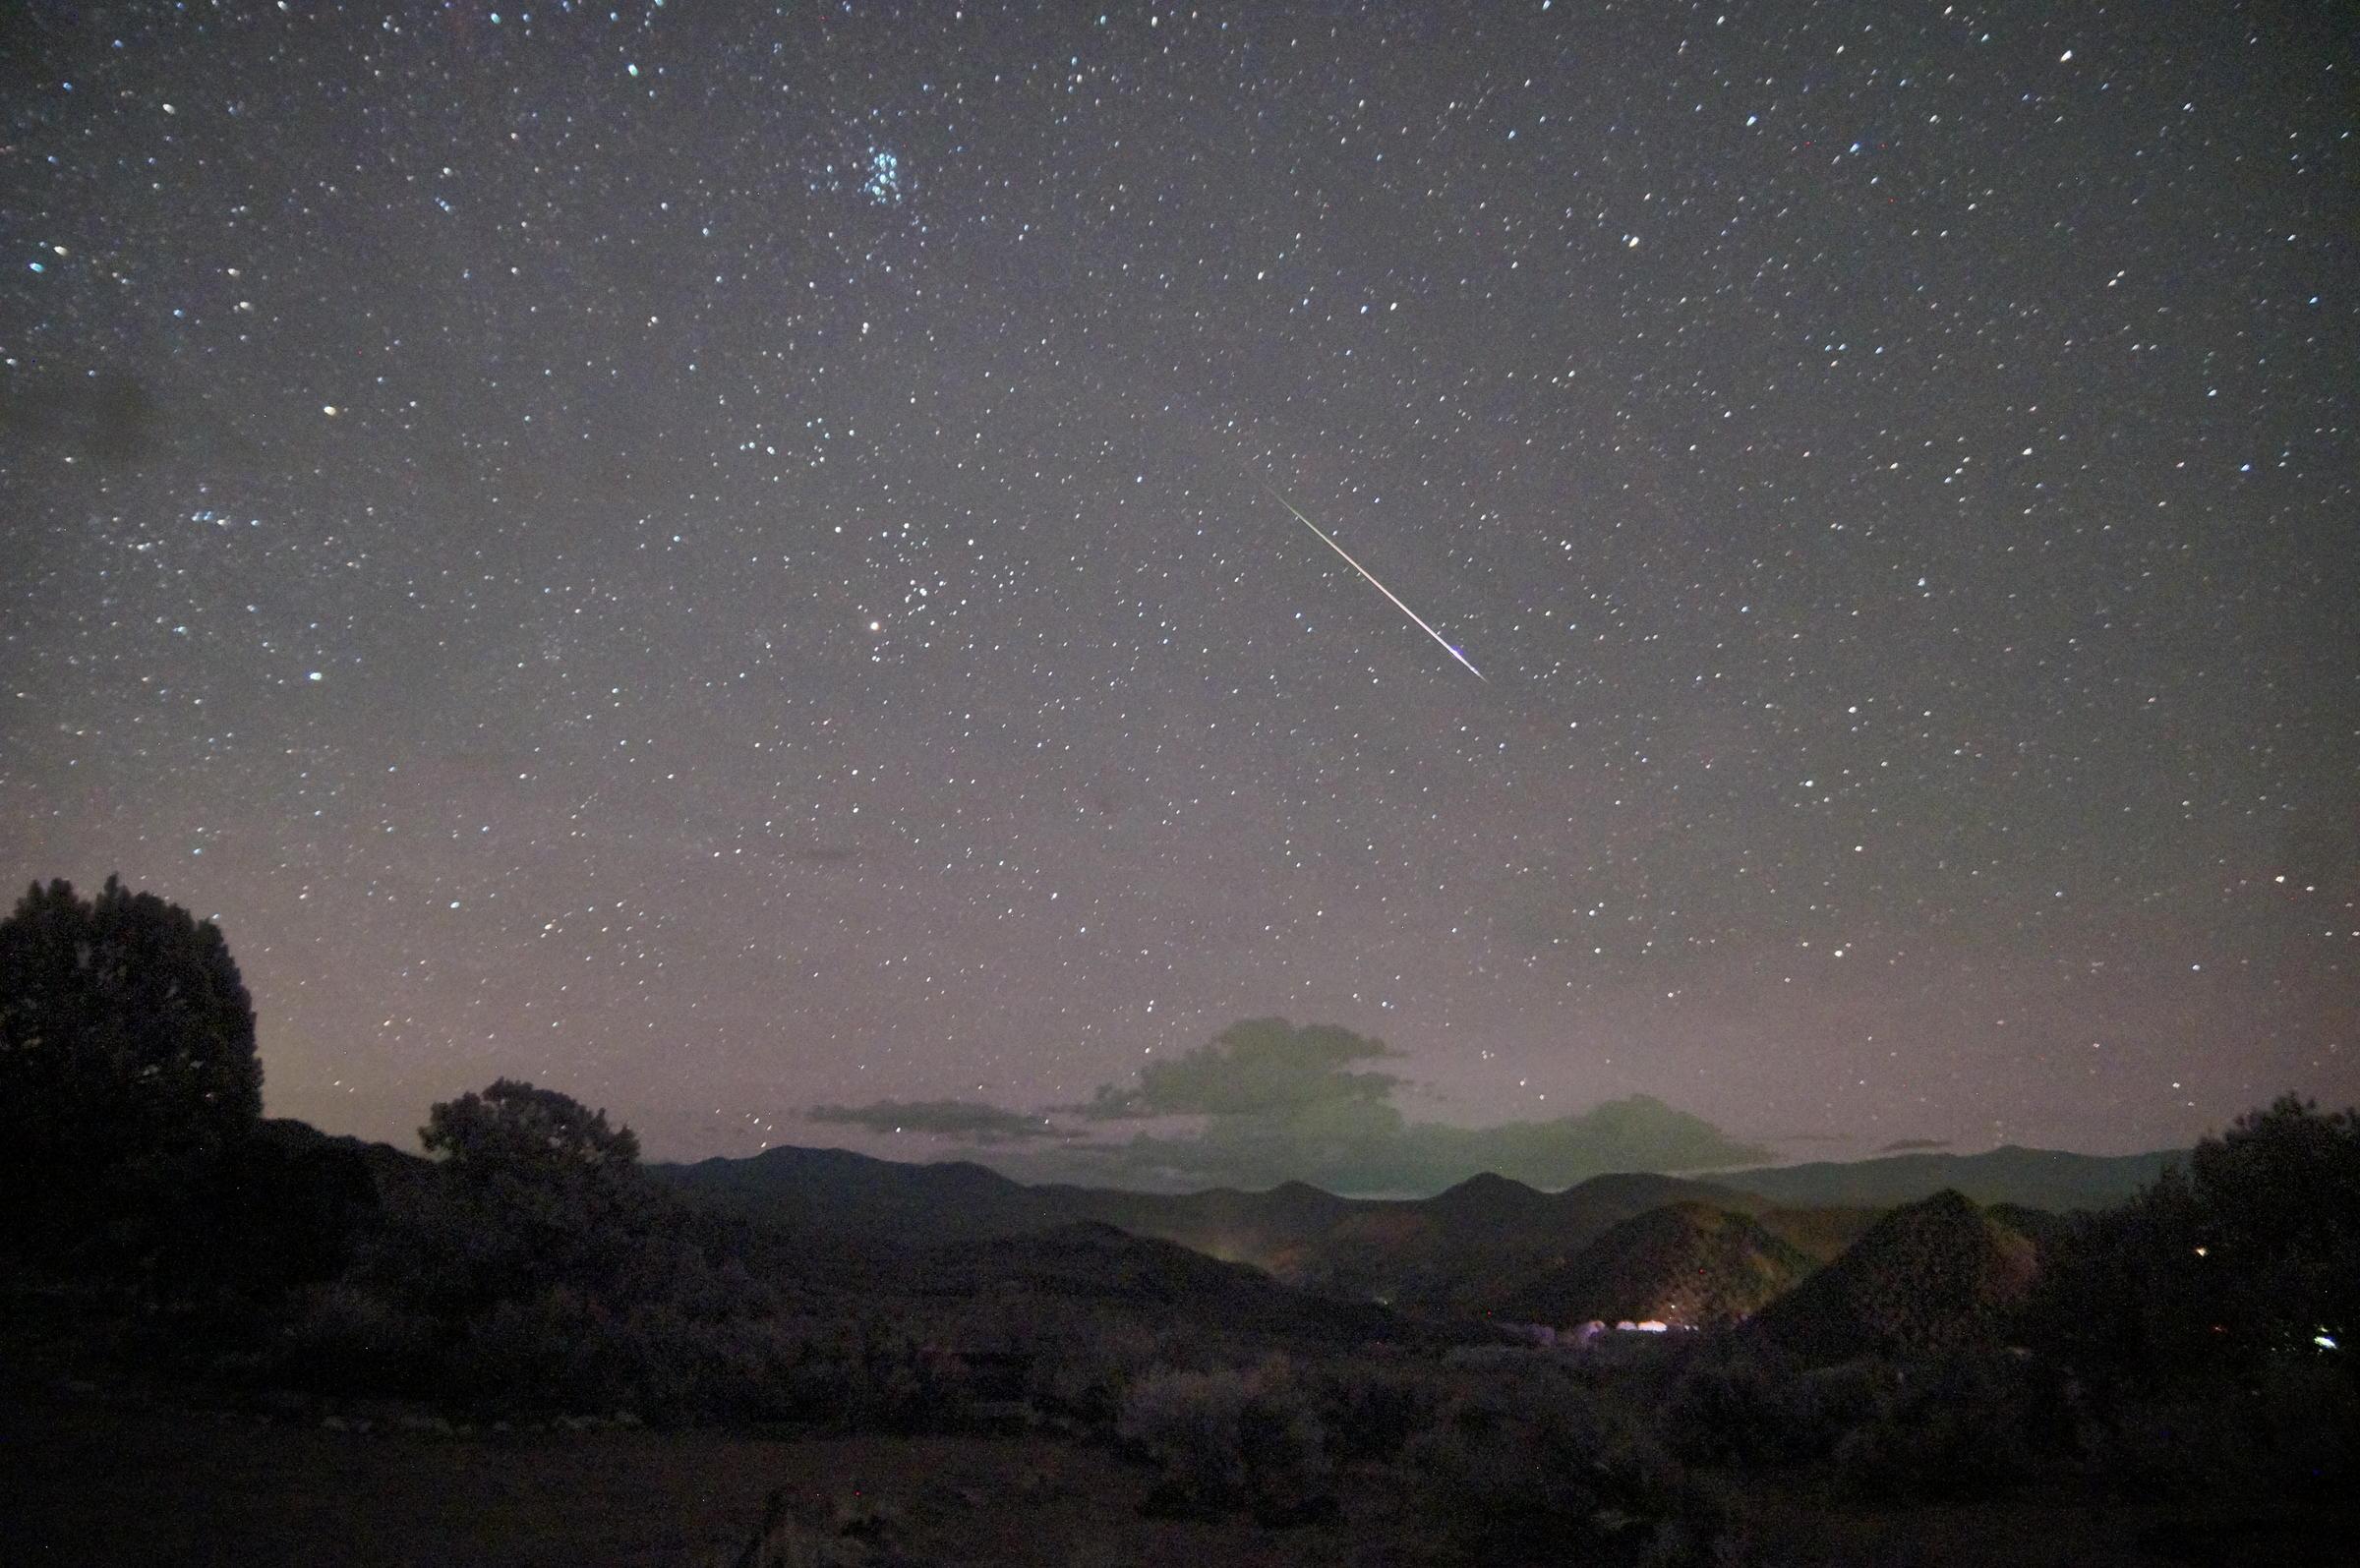 2018 Cosmic Calendar (north America) With Zodiac, Meteors ...  |Meteor Shower Calendar 2013 North America